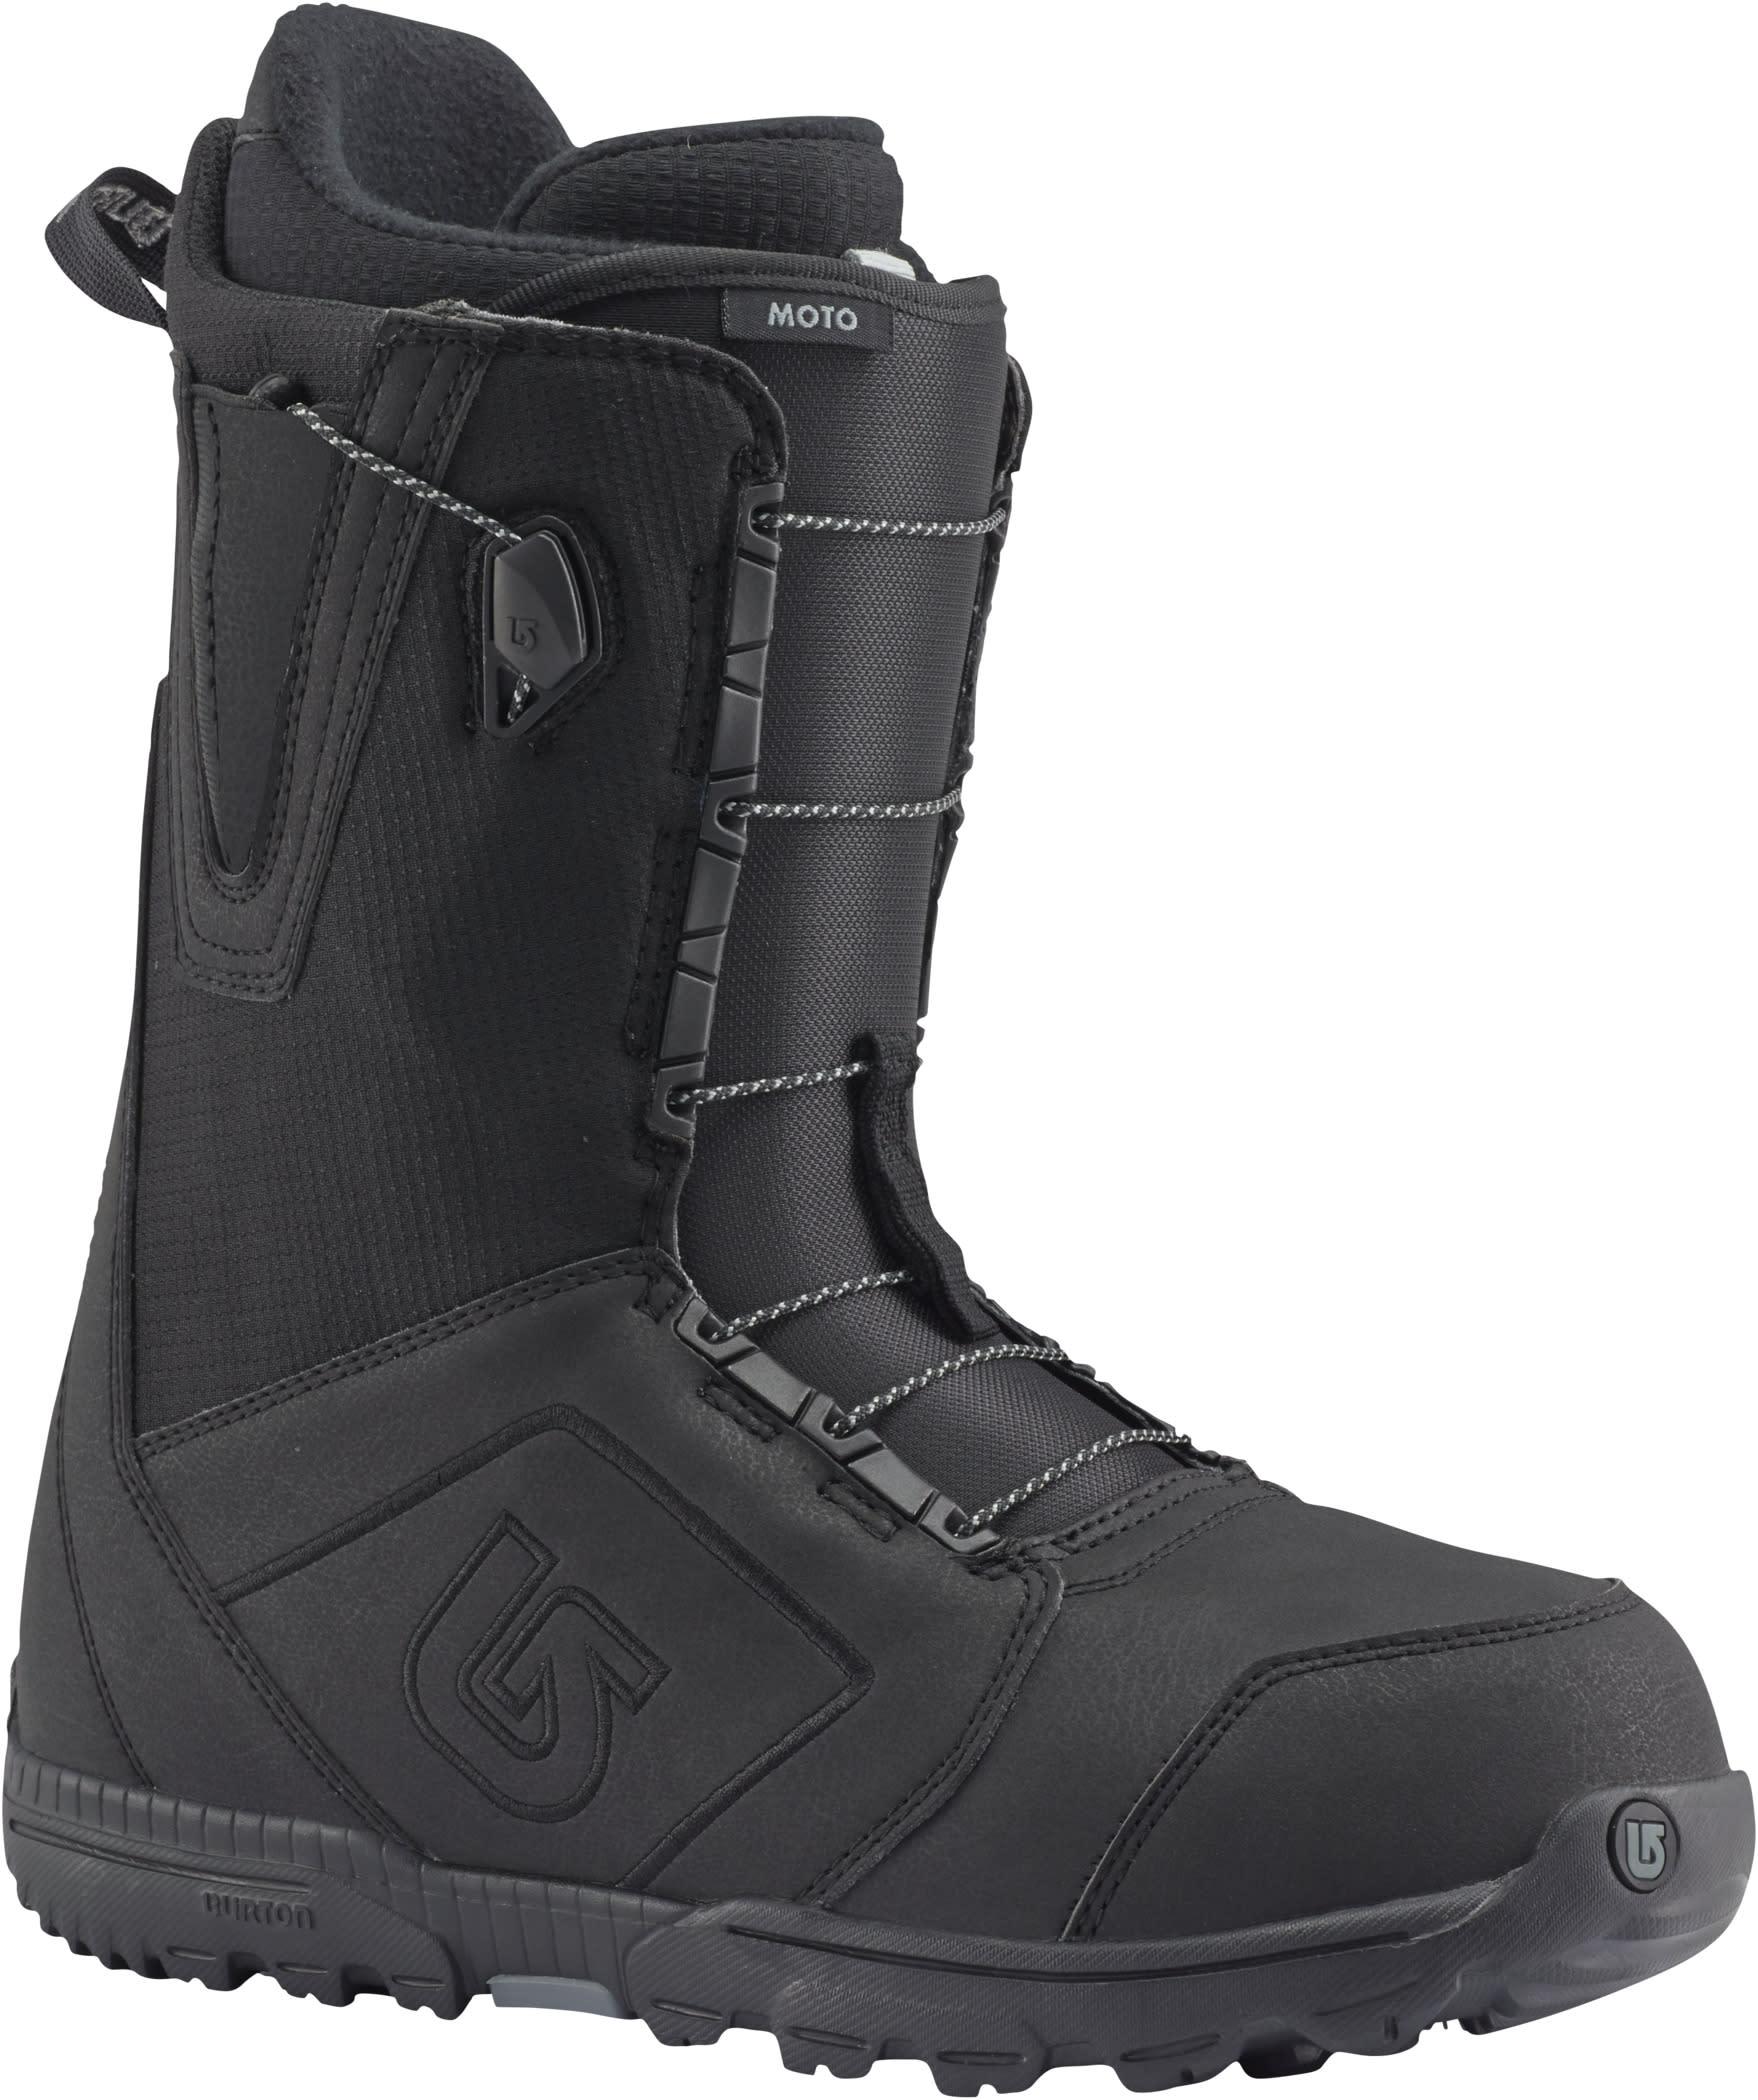 Burton Moto R Snowboard Boots